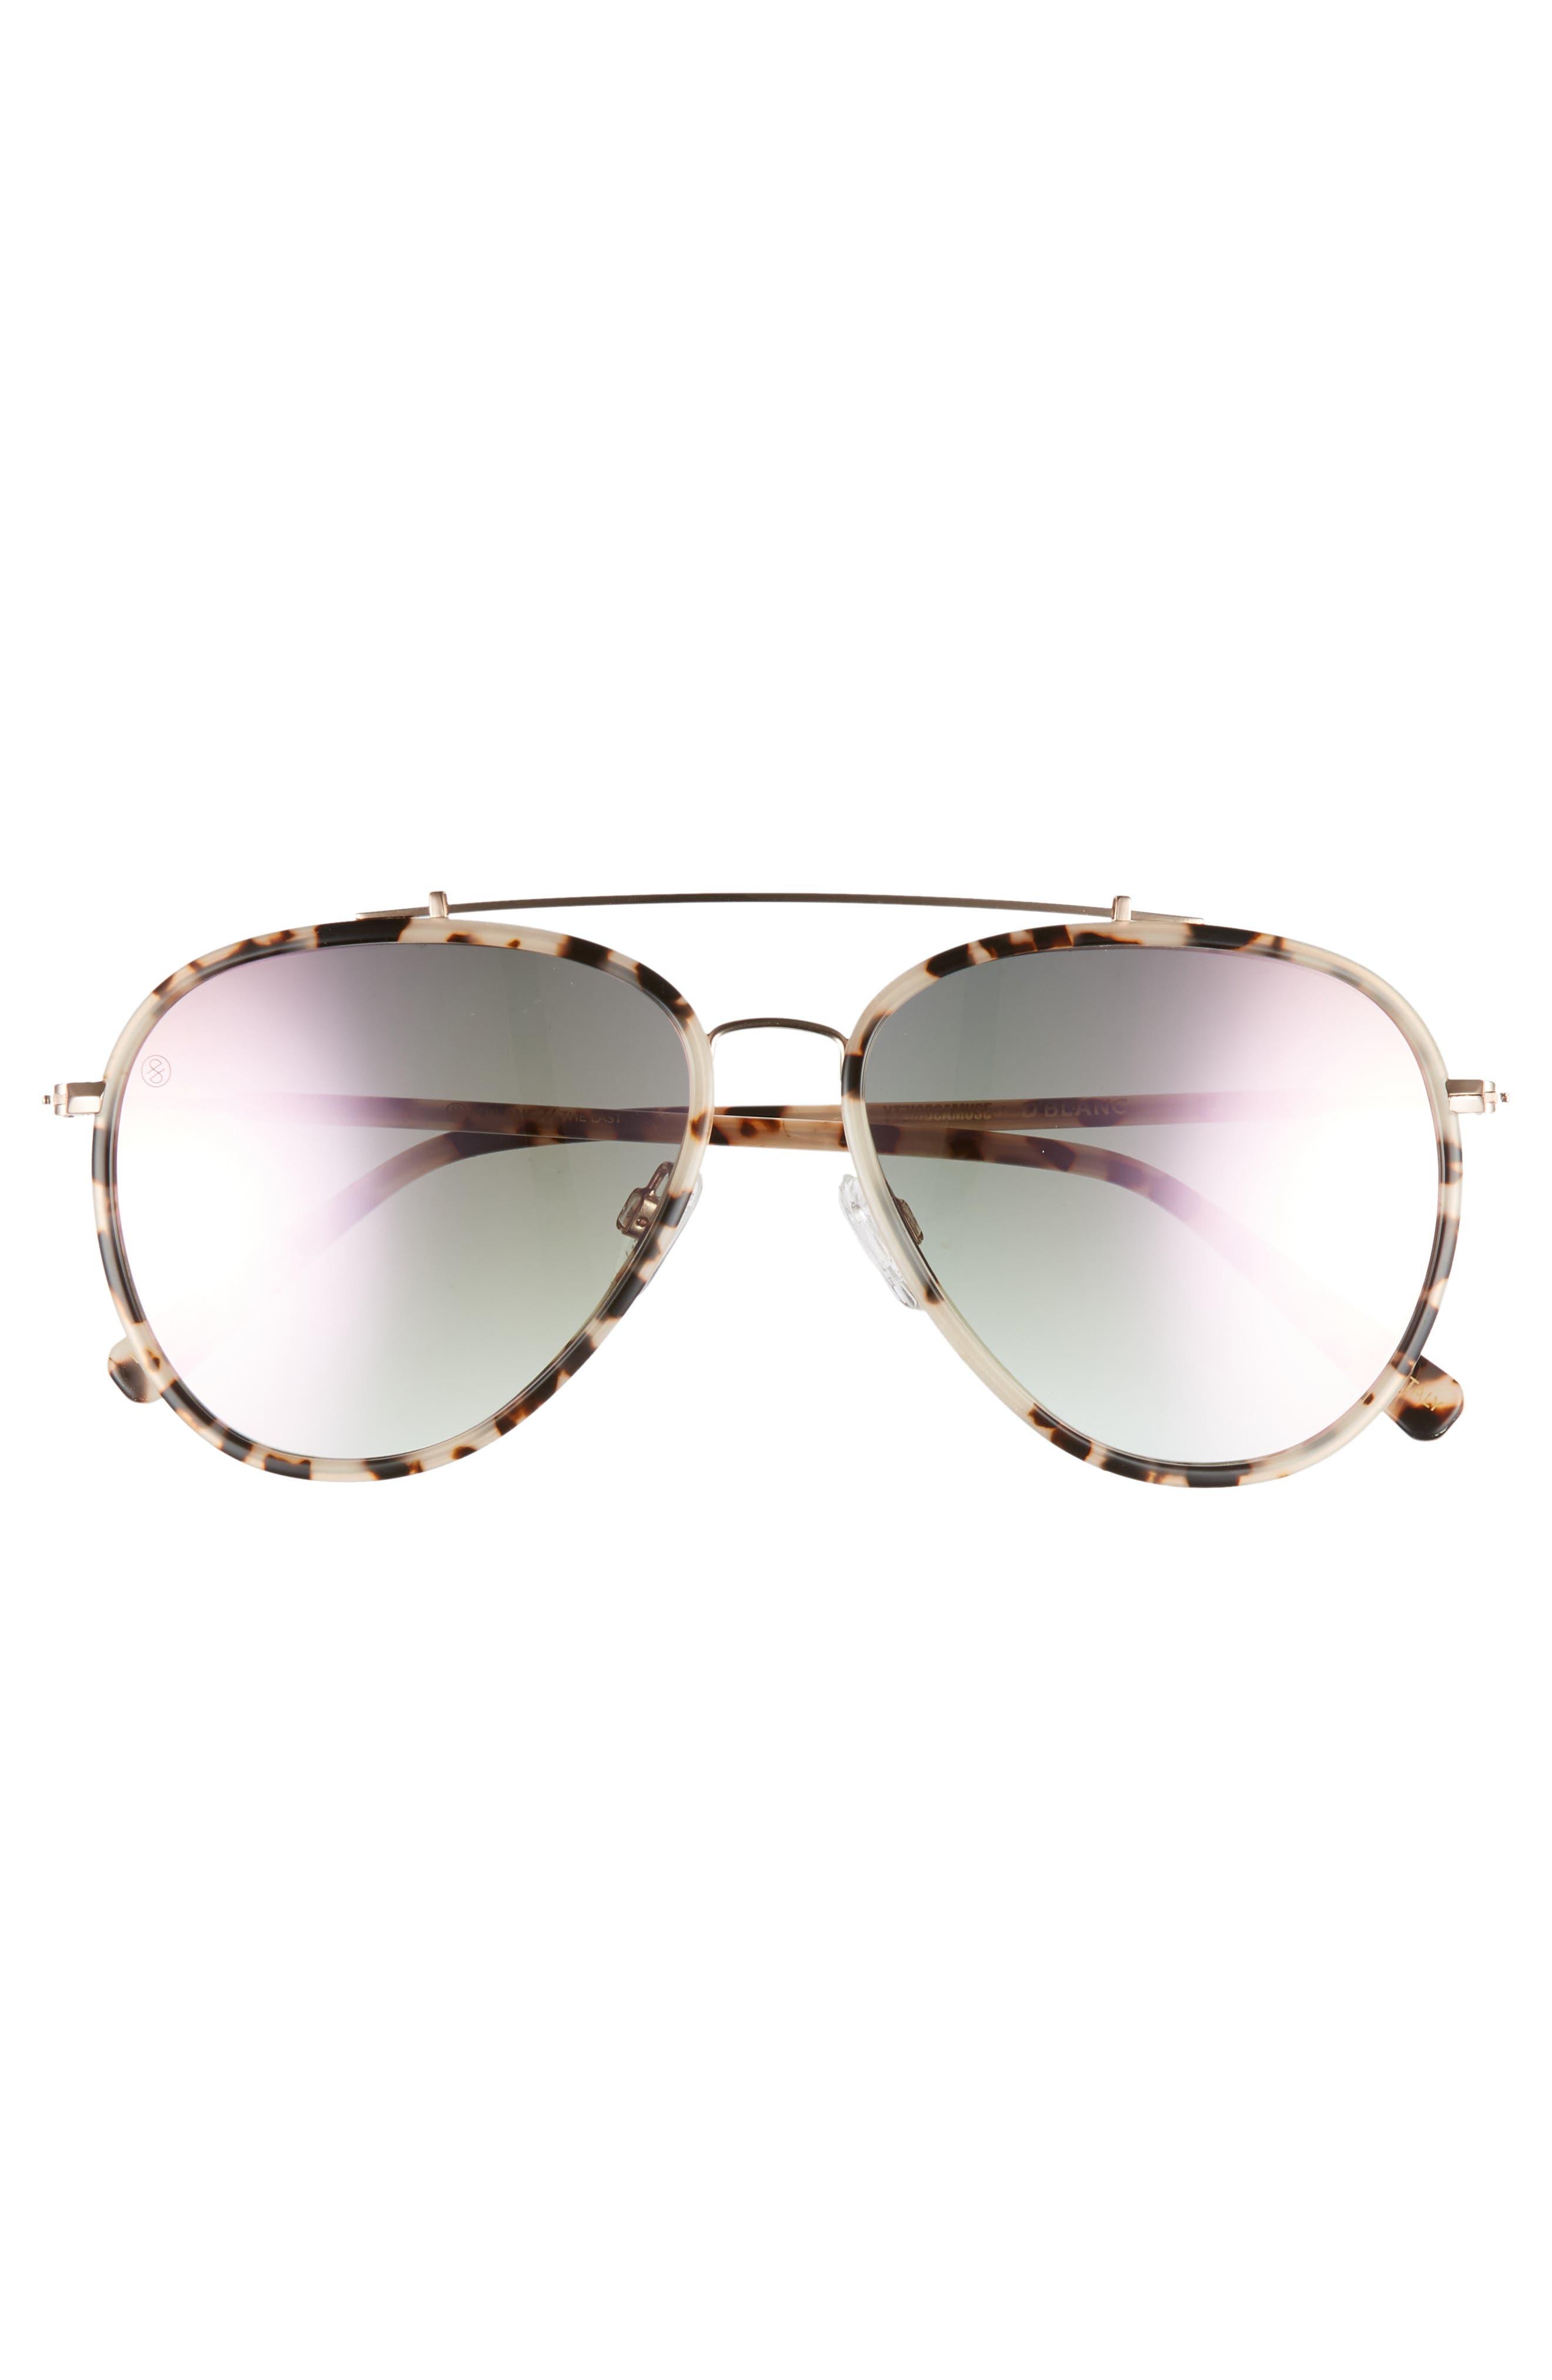 D'BLANC The Last 57mm Aviator Sunglasses,                             Alternate thumbnail 3, color,                             Snow Leopard/ Rose Flash